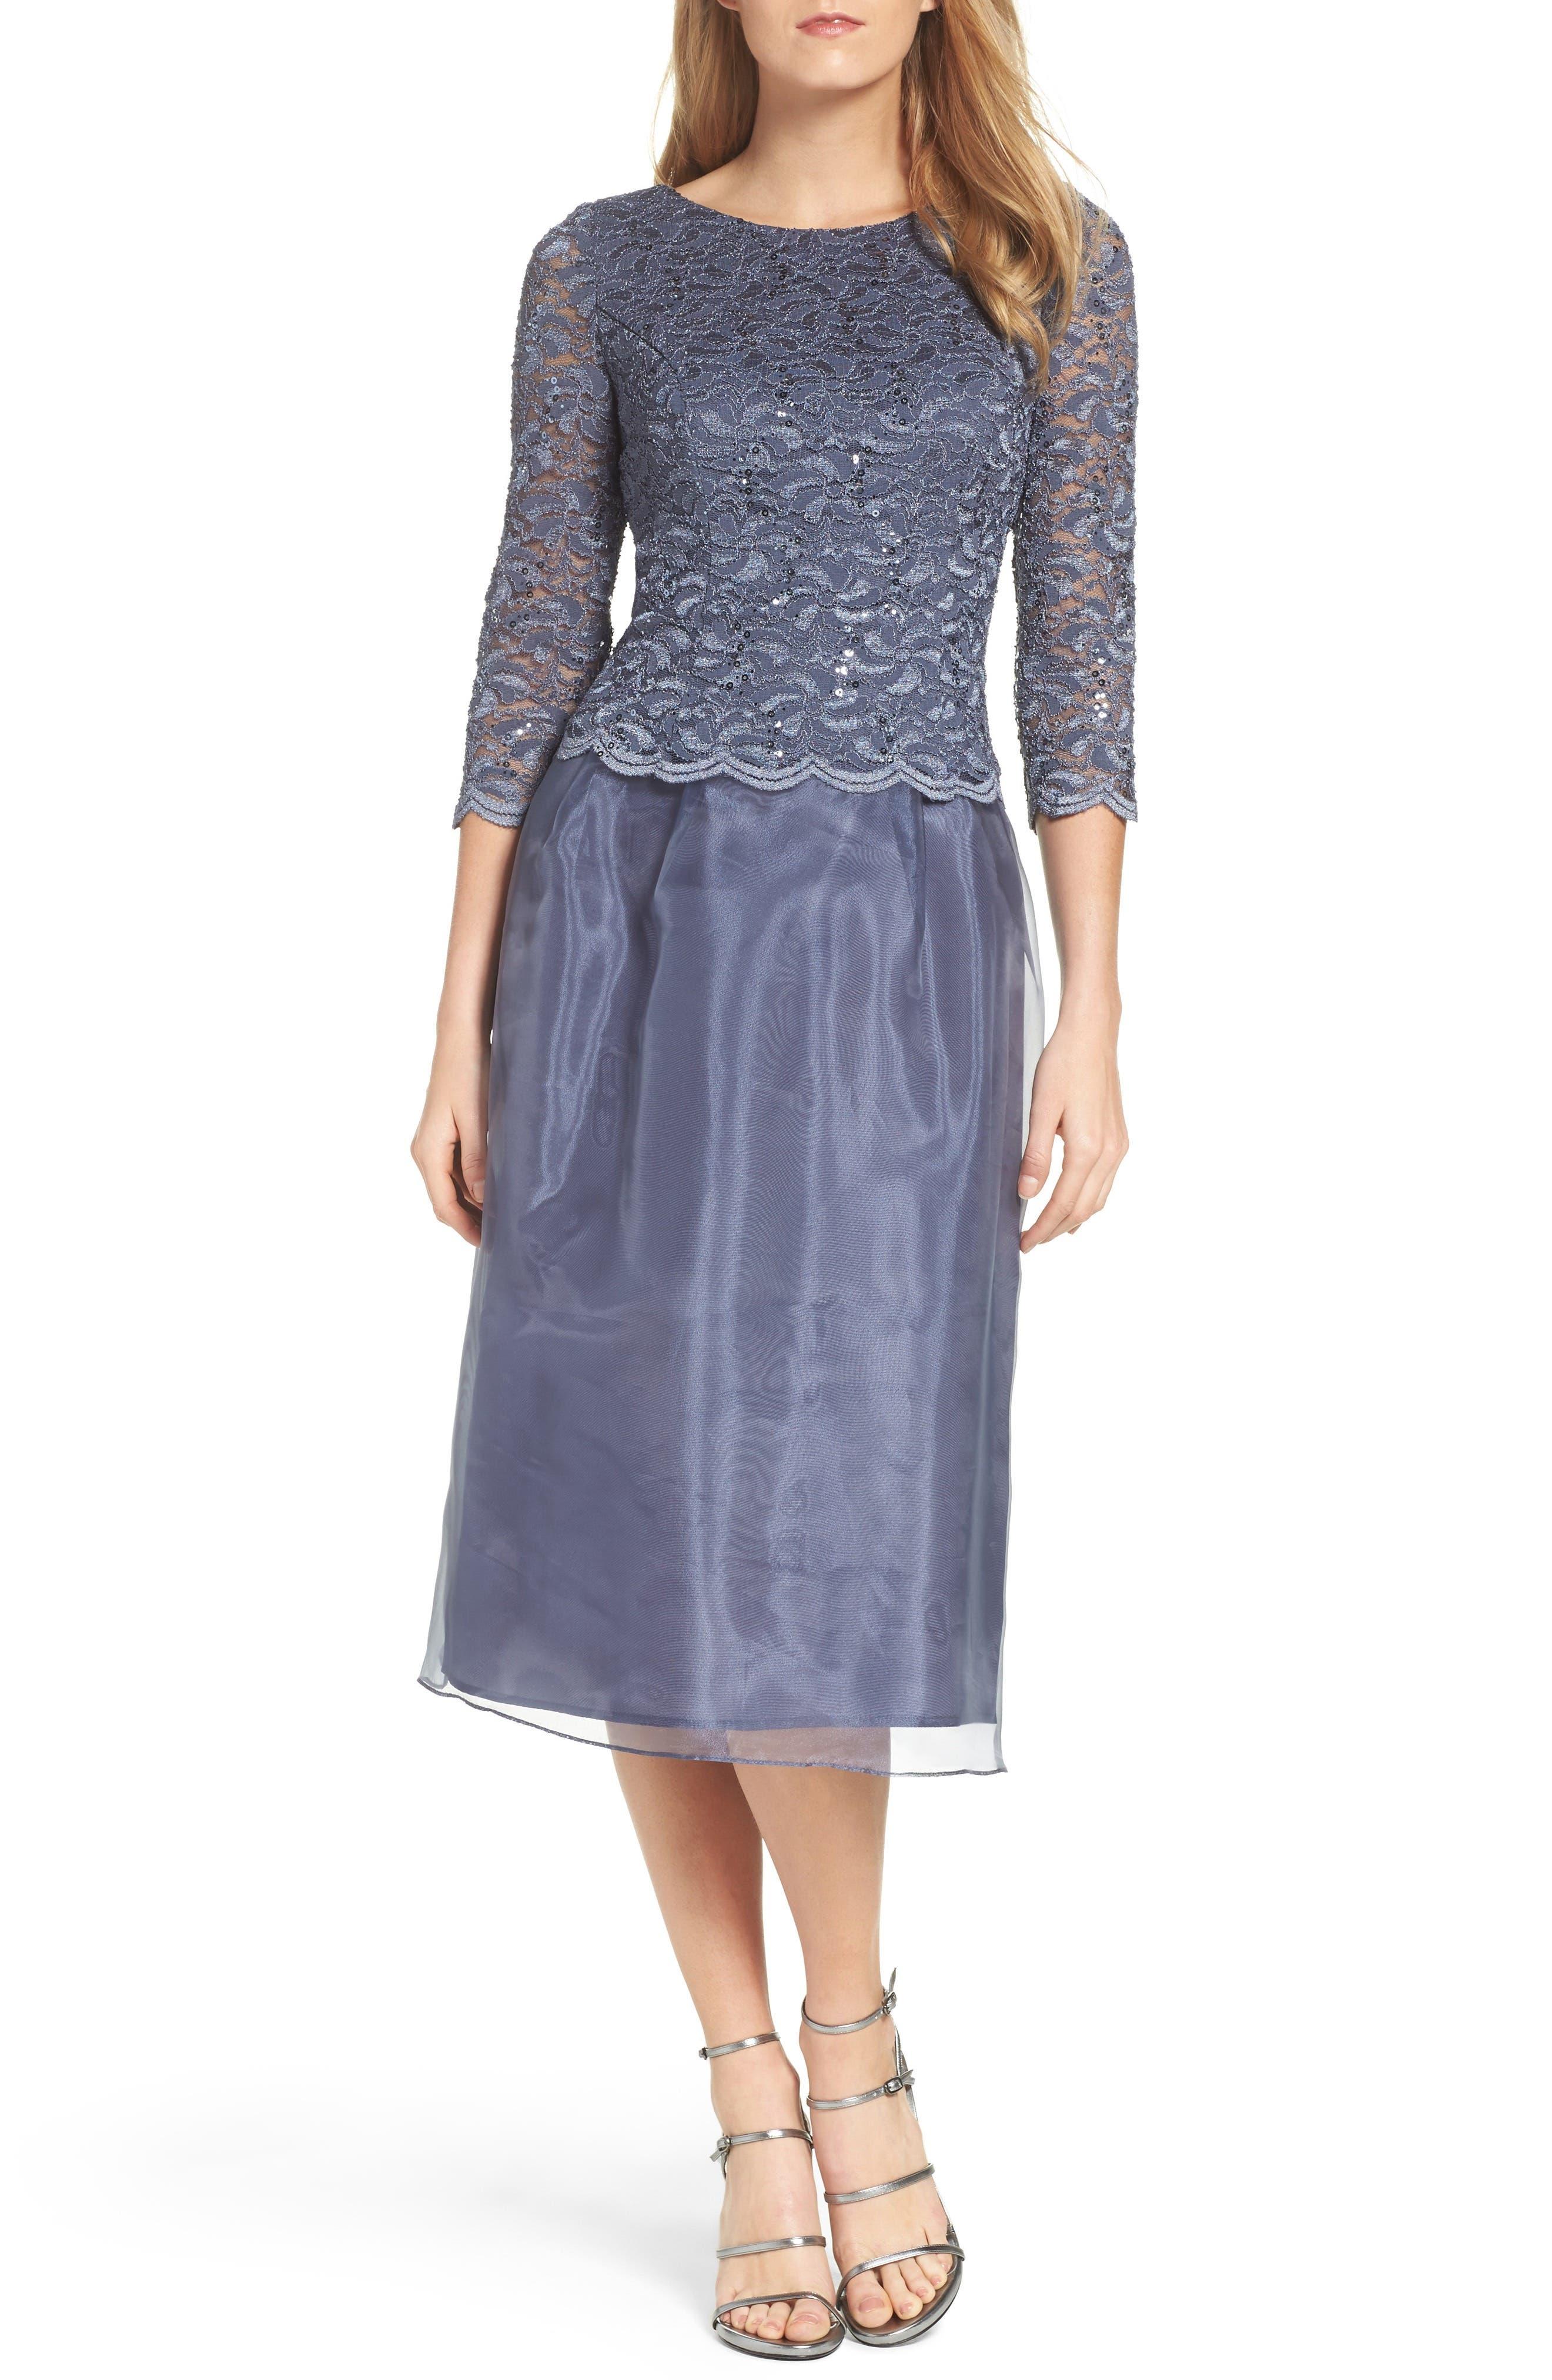 Alternate Image 1 Selected - Alex Evenings Mixed Media Fit & Flare Dress (Regular & Petite)